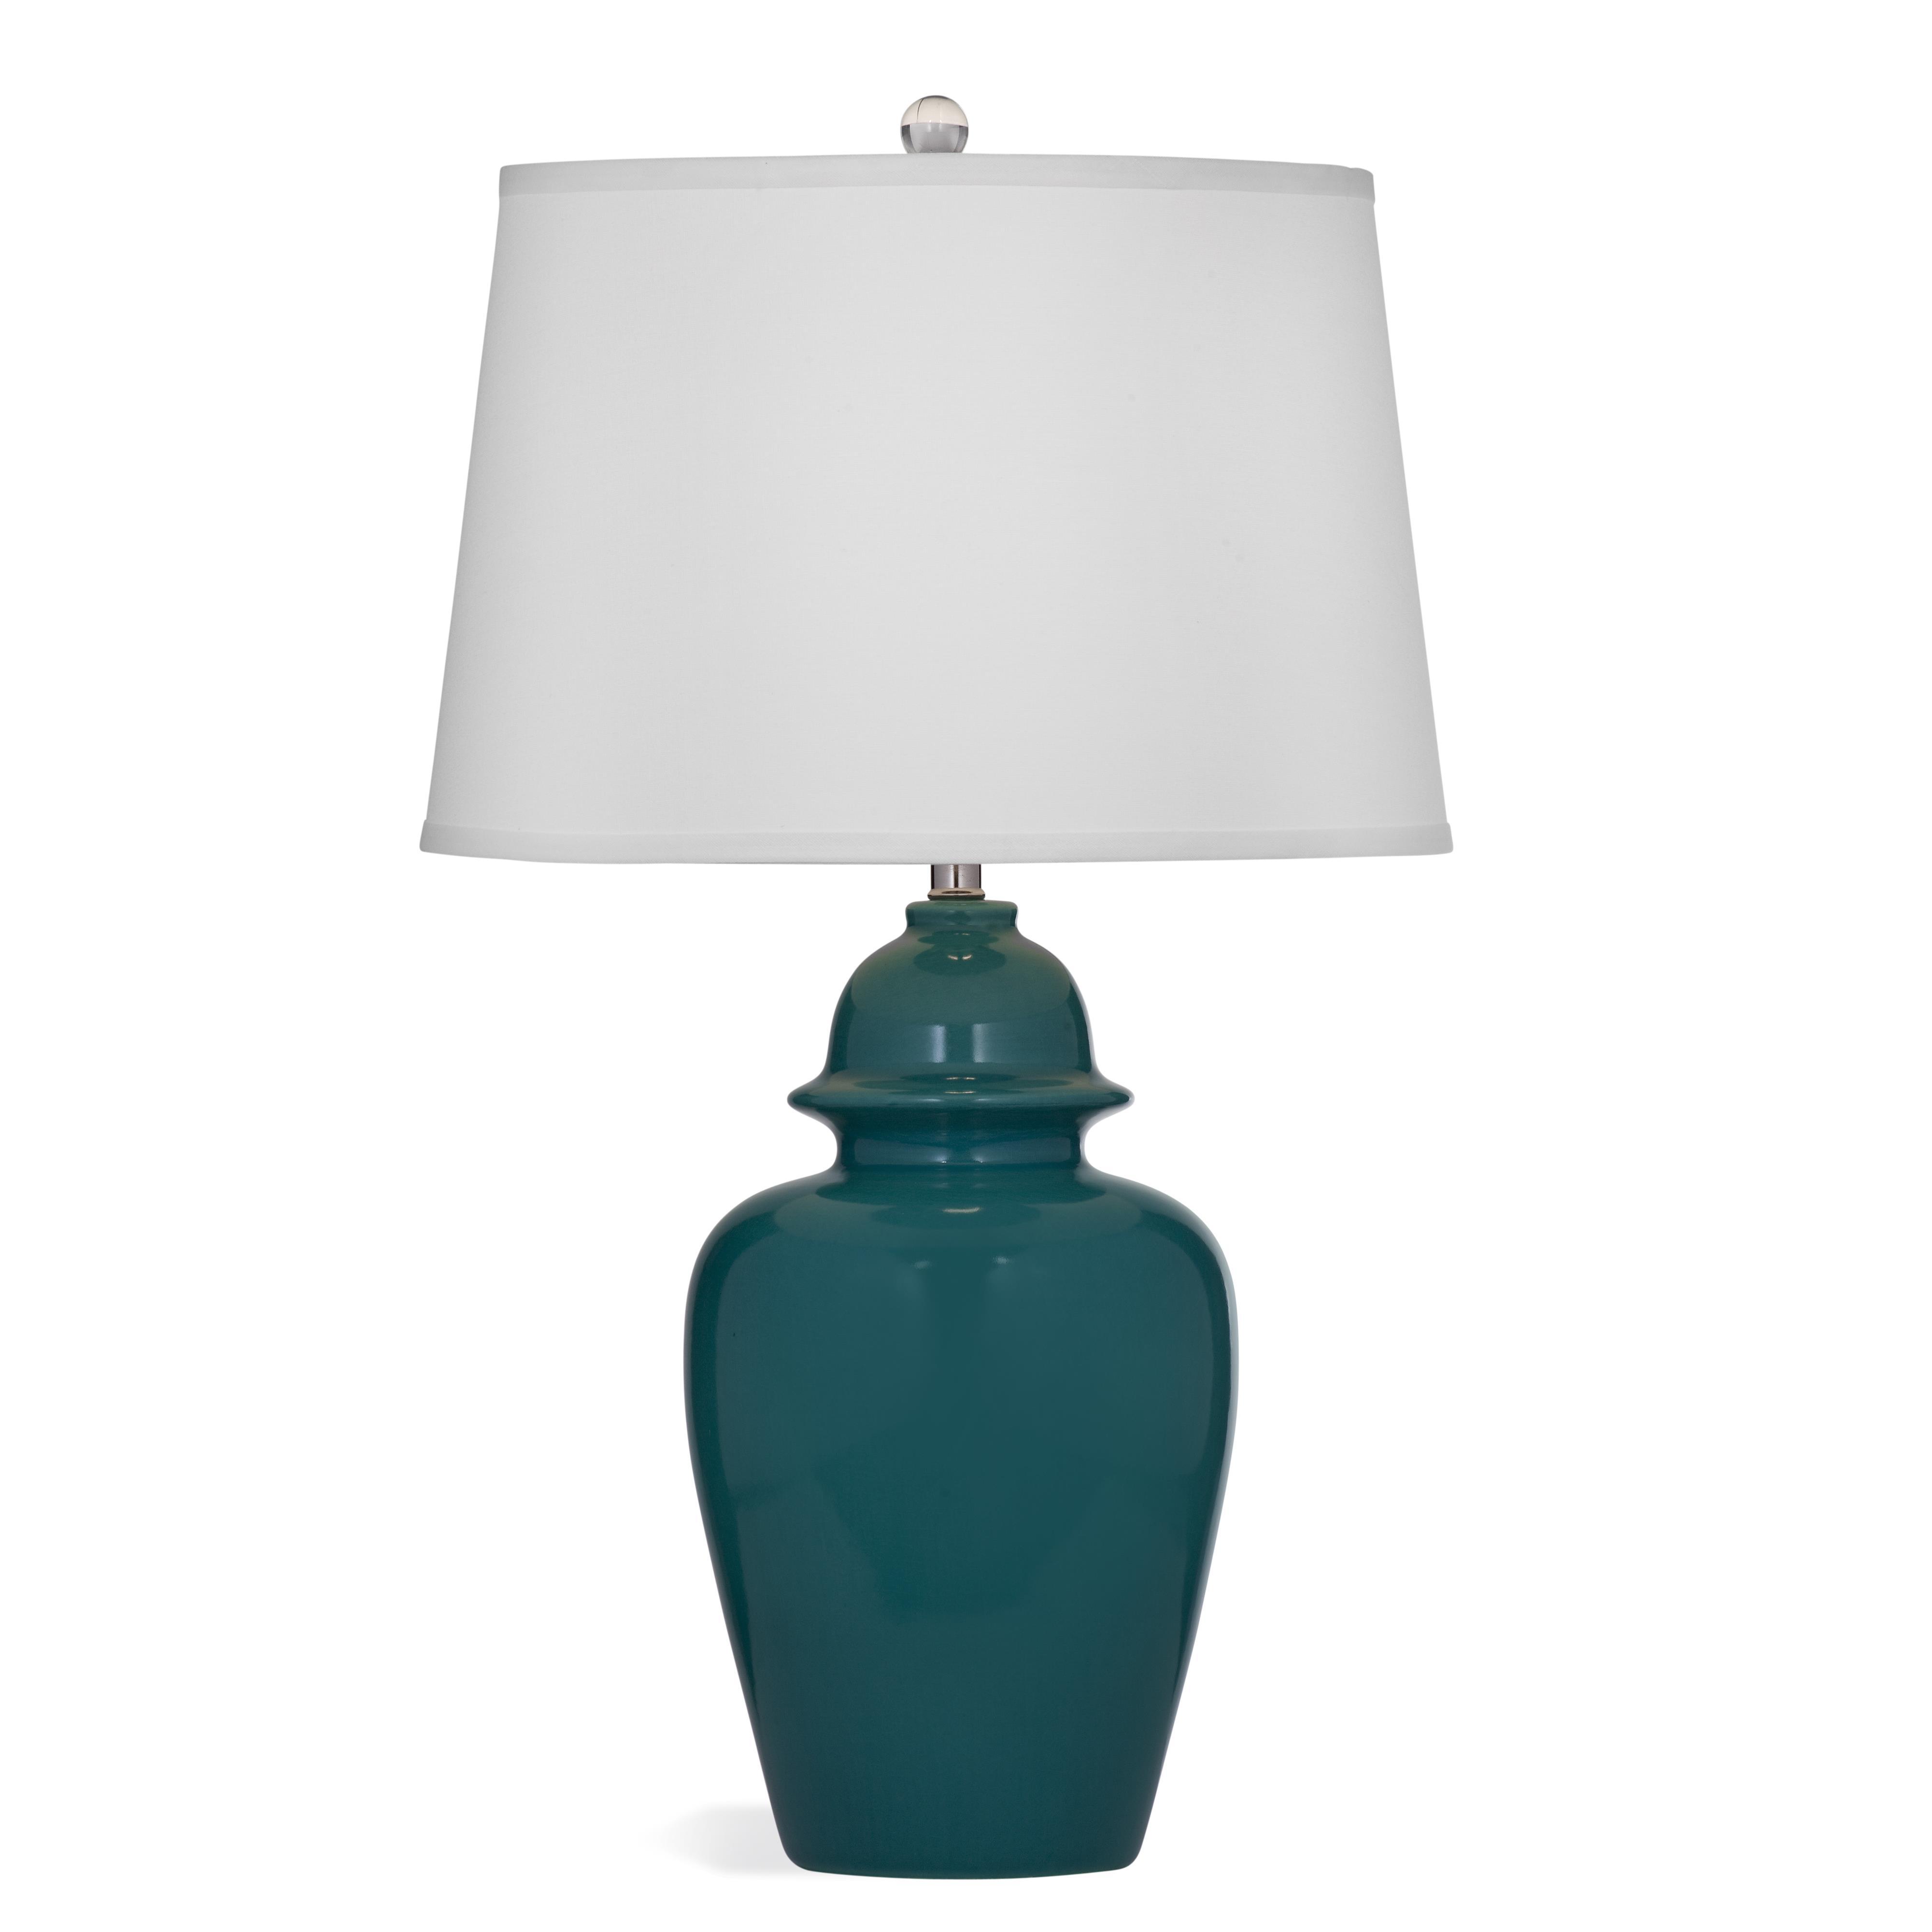 Juno Table Lamp